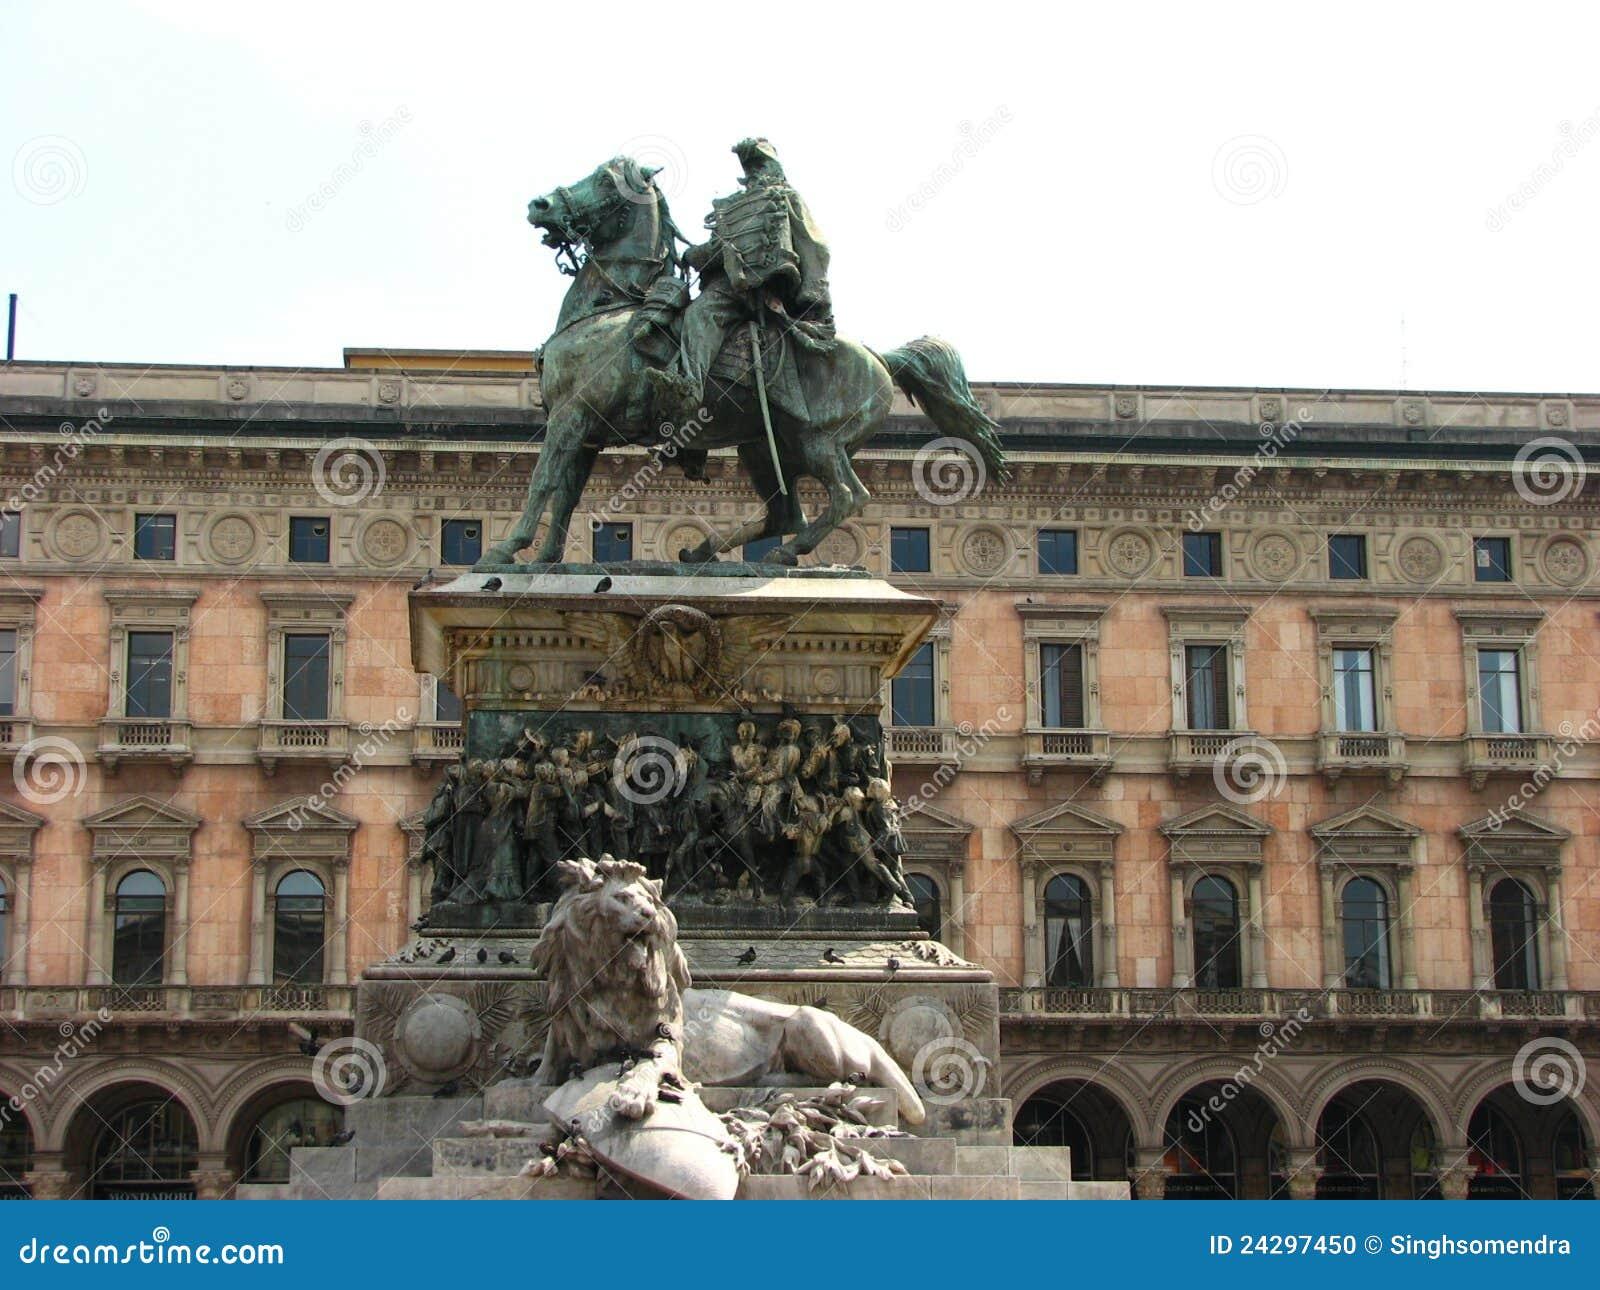 Victory Statue At Piazza Del Duomo Milan Italy Stock